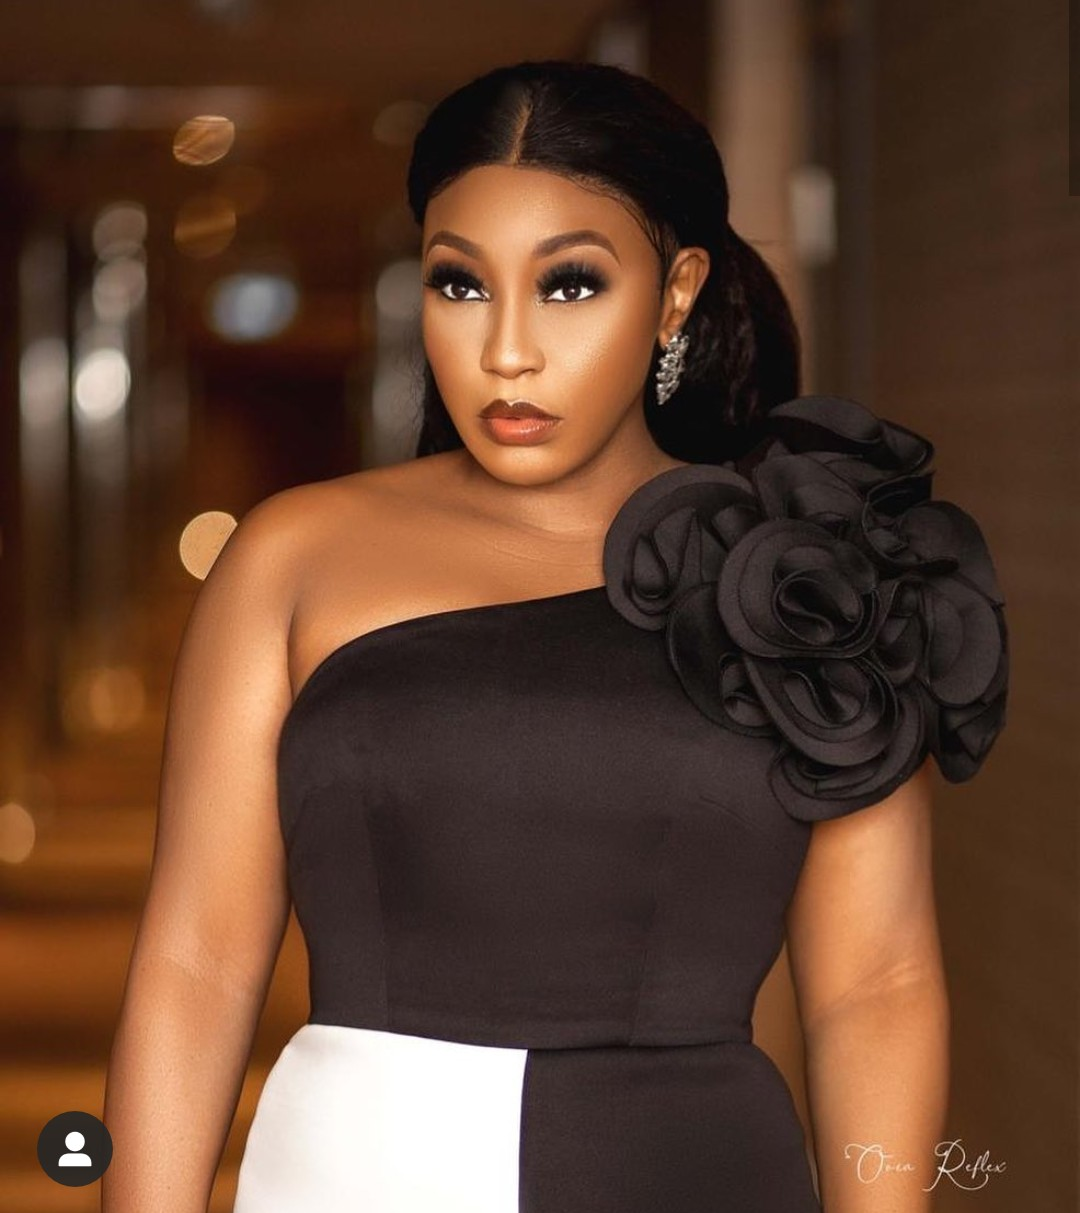 MI Abaga reveals he has a crush on Rita Dominic